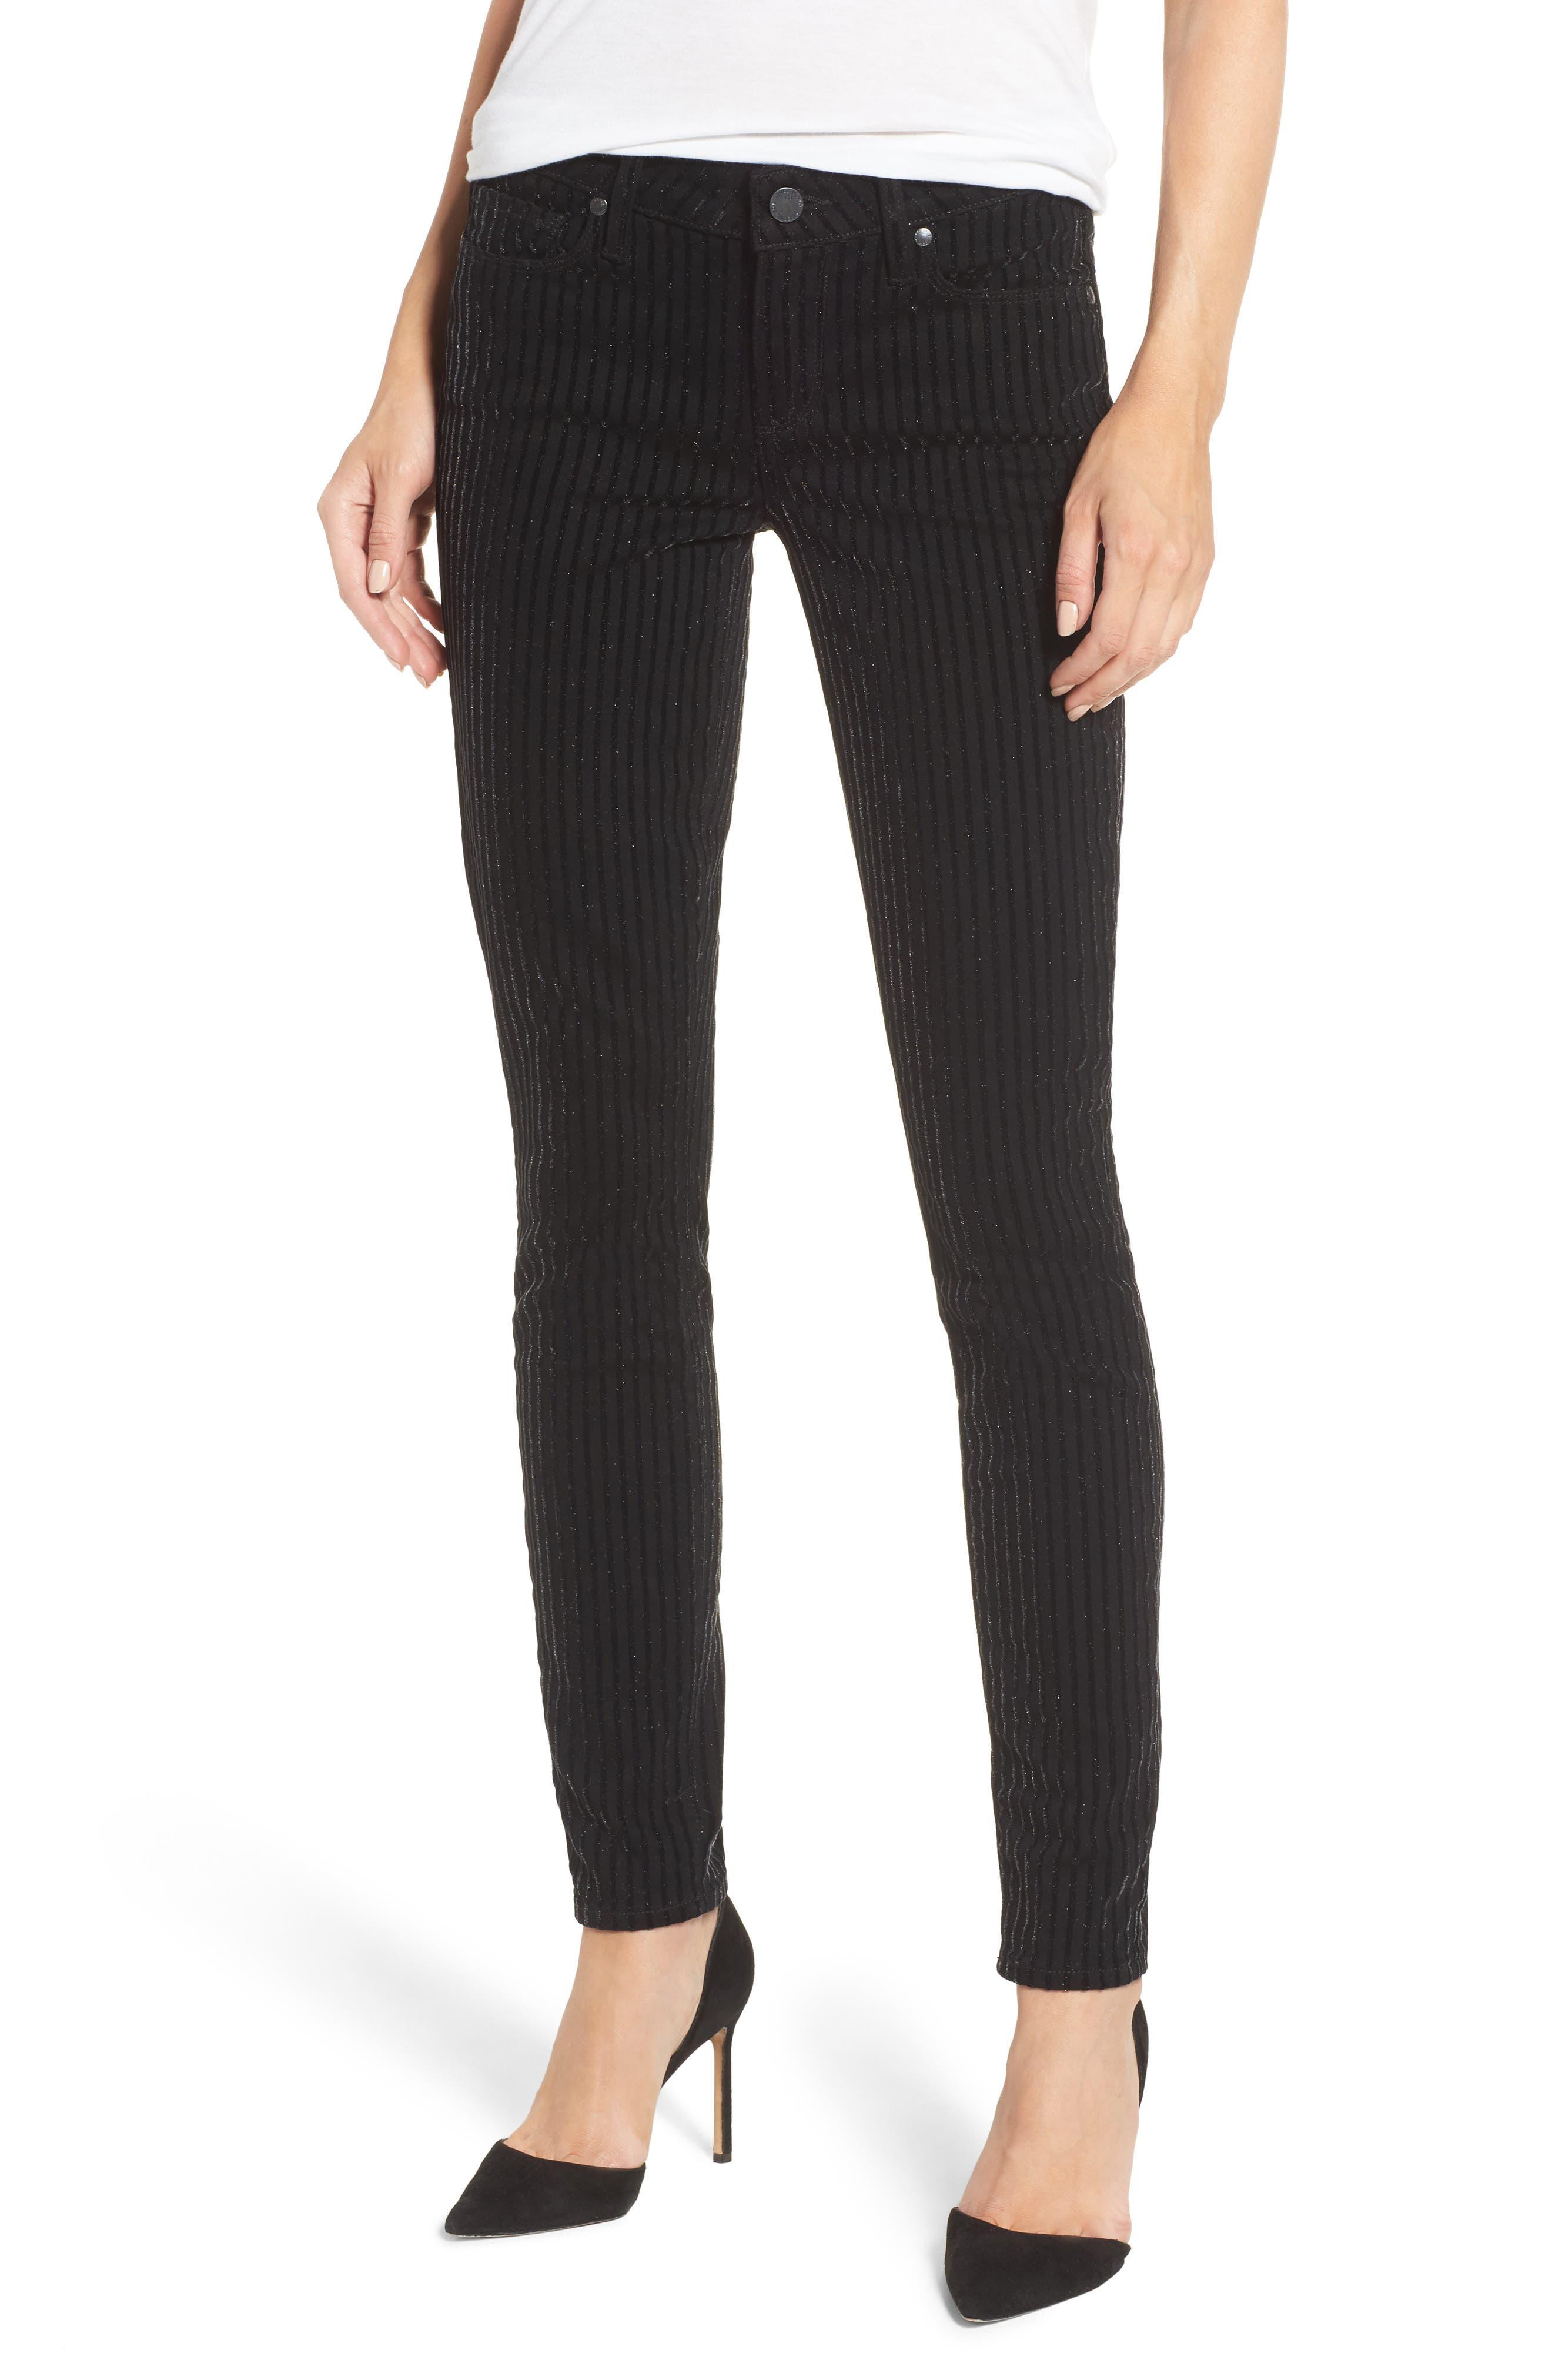 Alternate Image 1 Selected - PAIGE Verdugo Ultra Skinny Jeans (Noir Flocked Stripe)